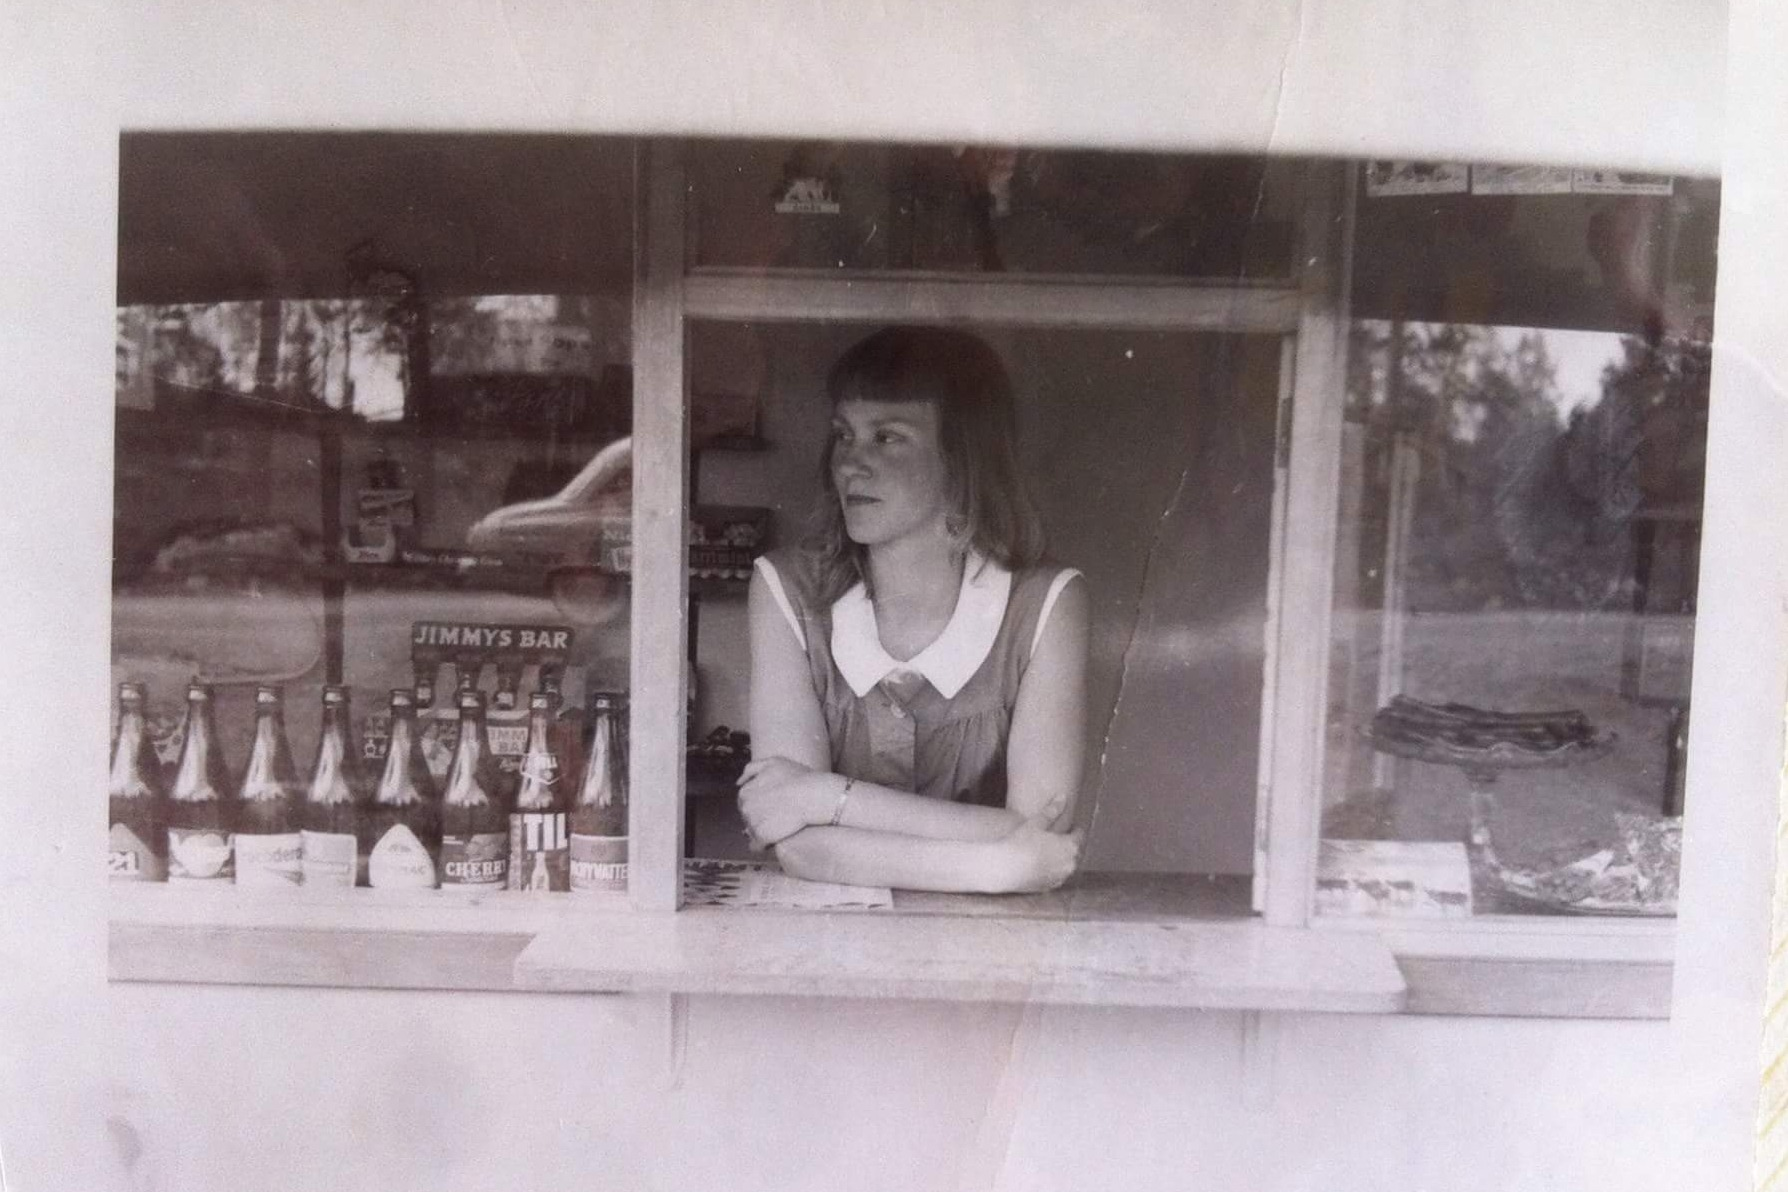 Gimarasten-Giman-First-Kiosk-1.jpg